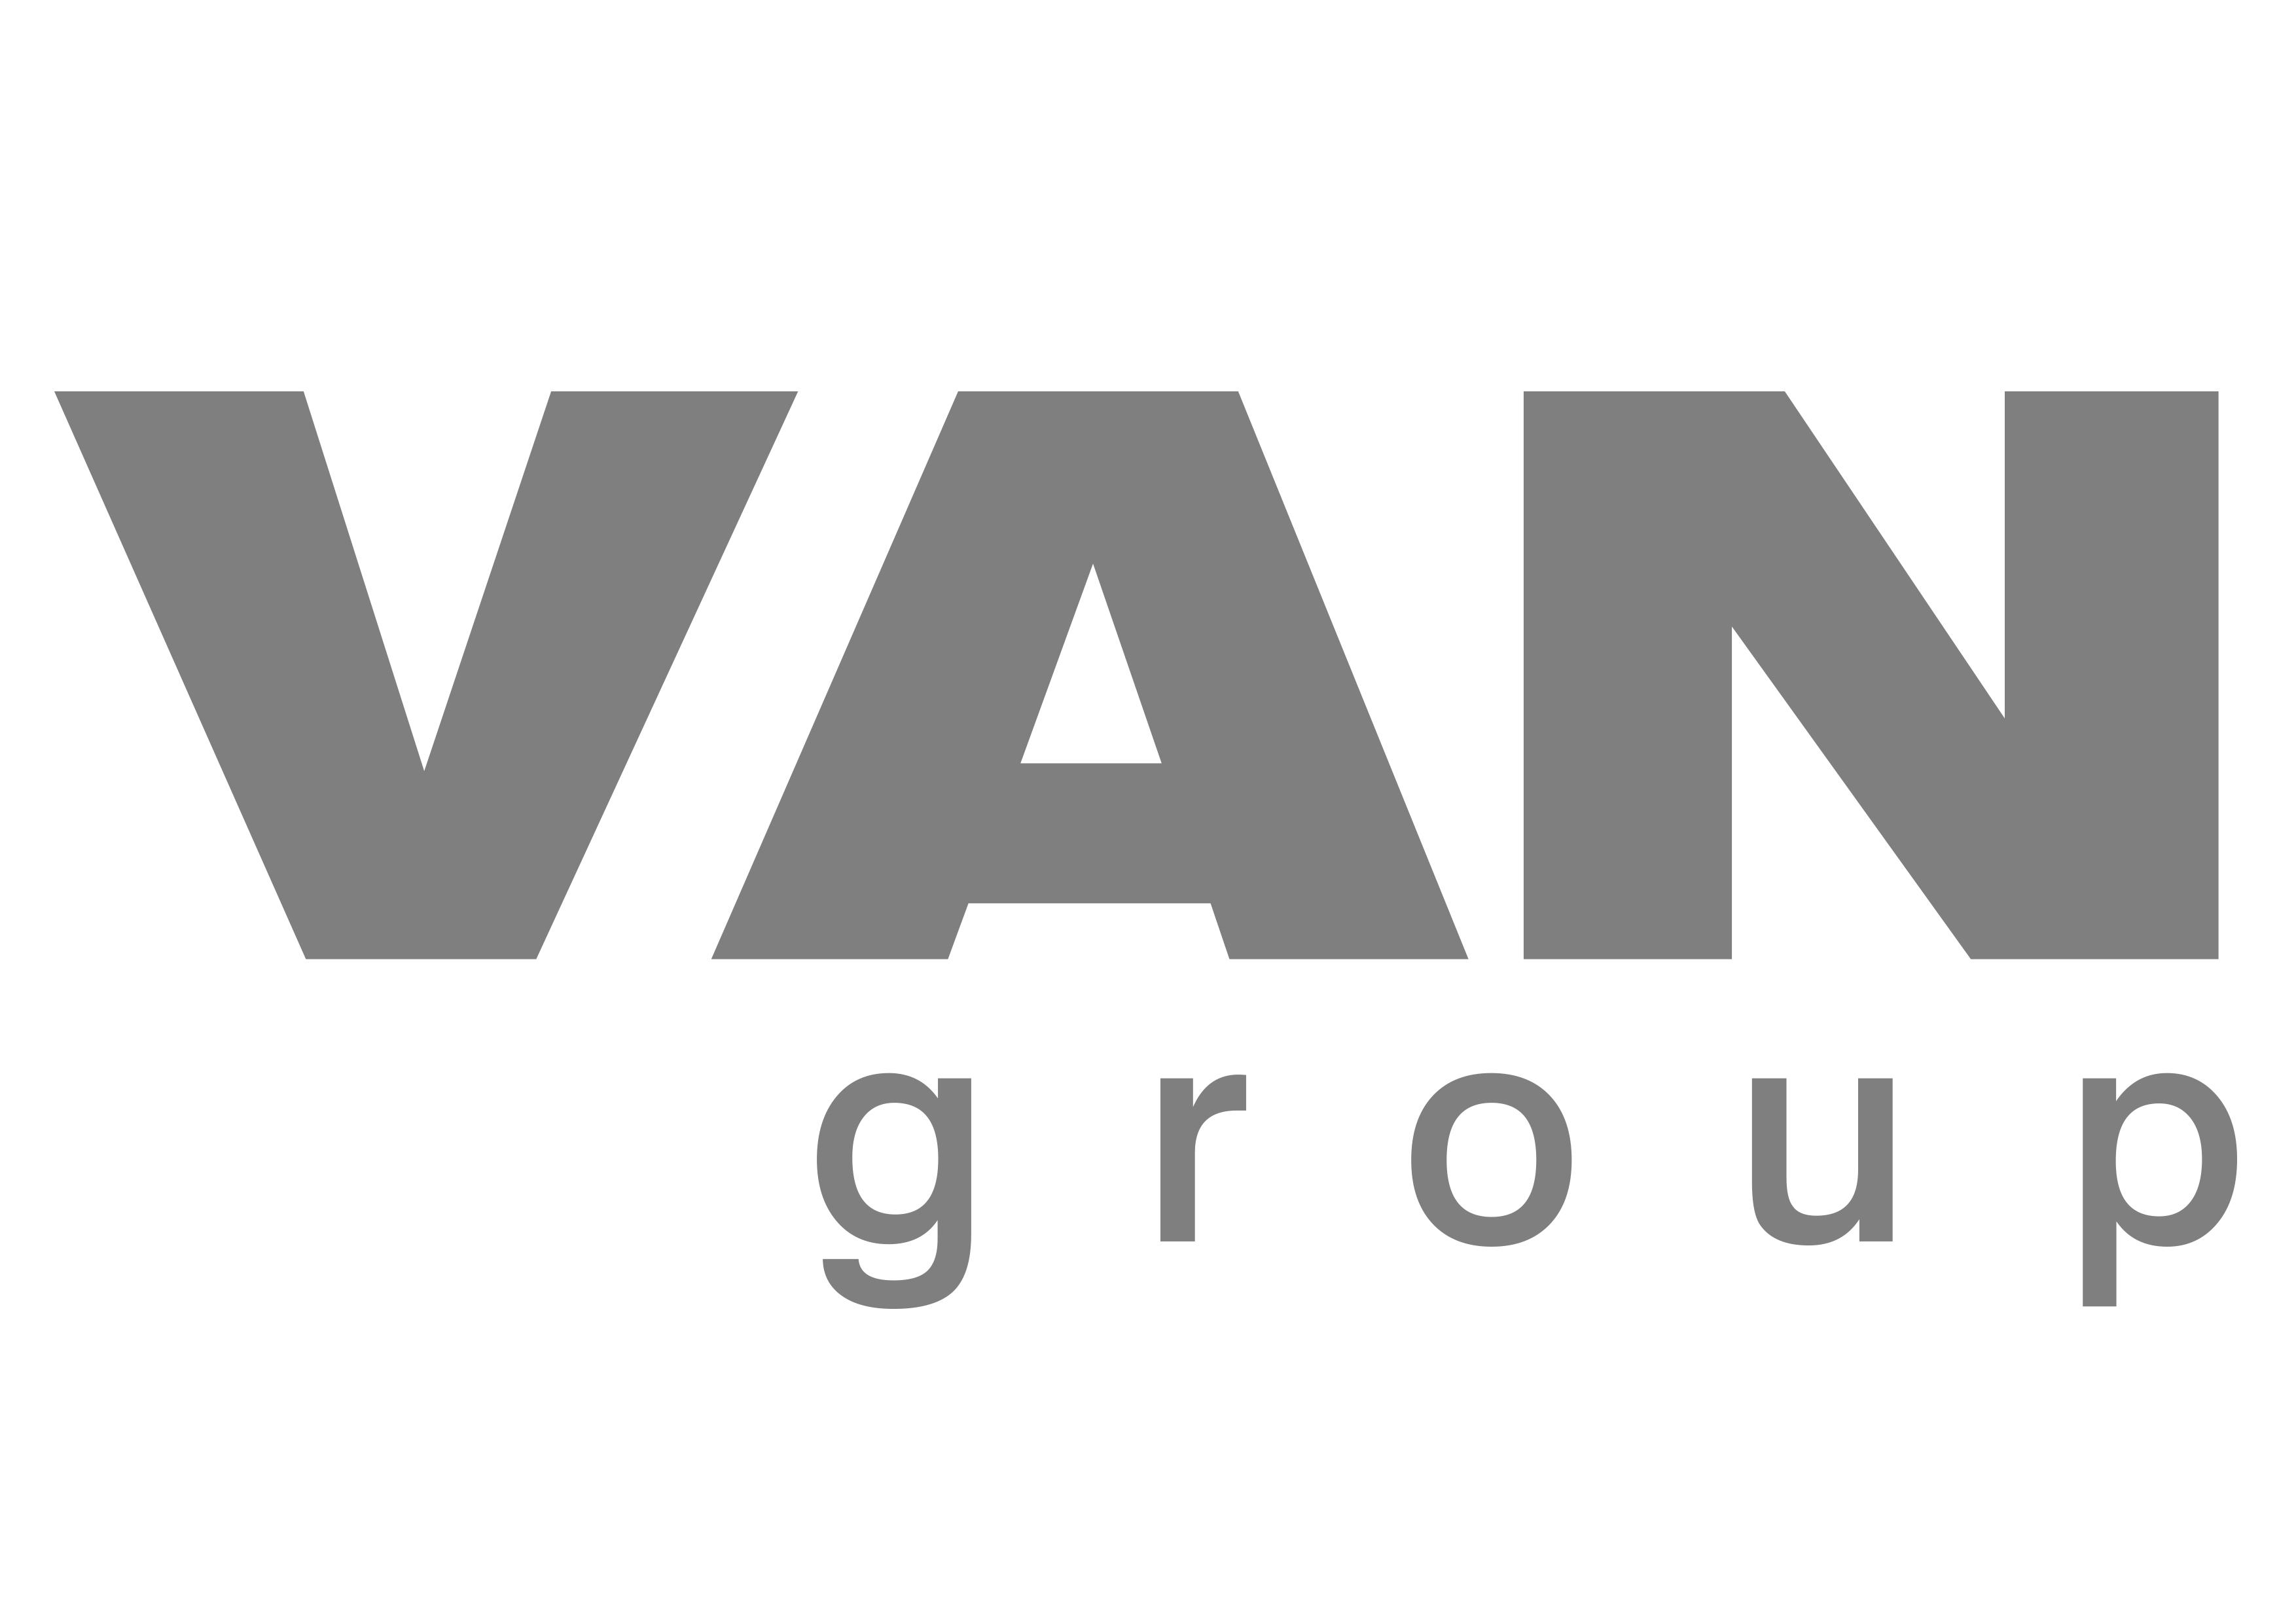 The Van Group logo